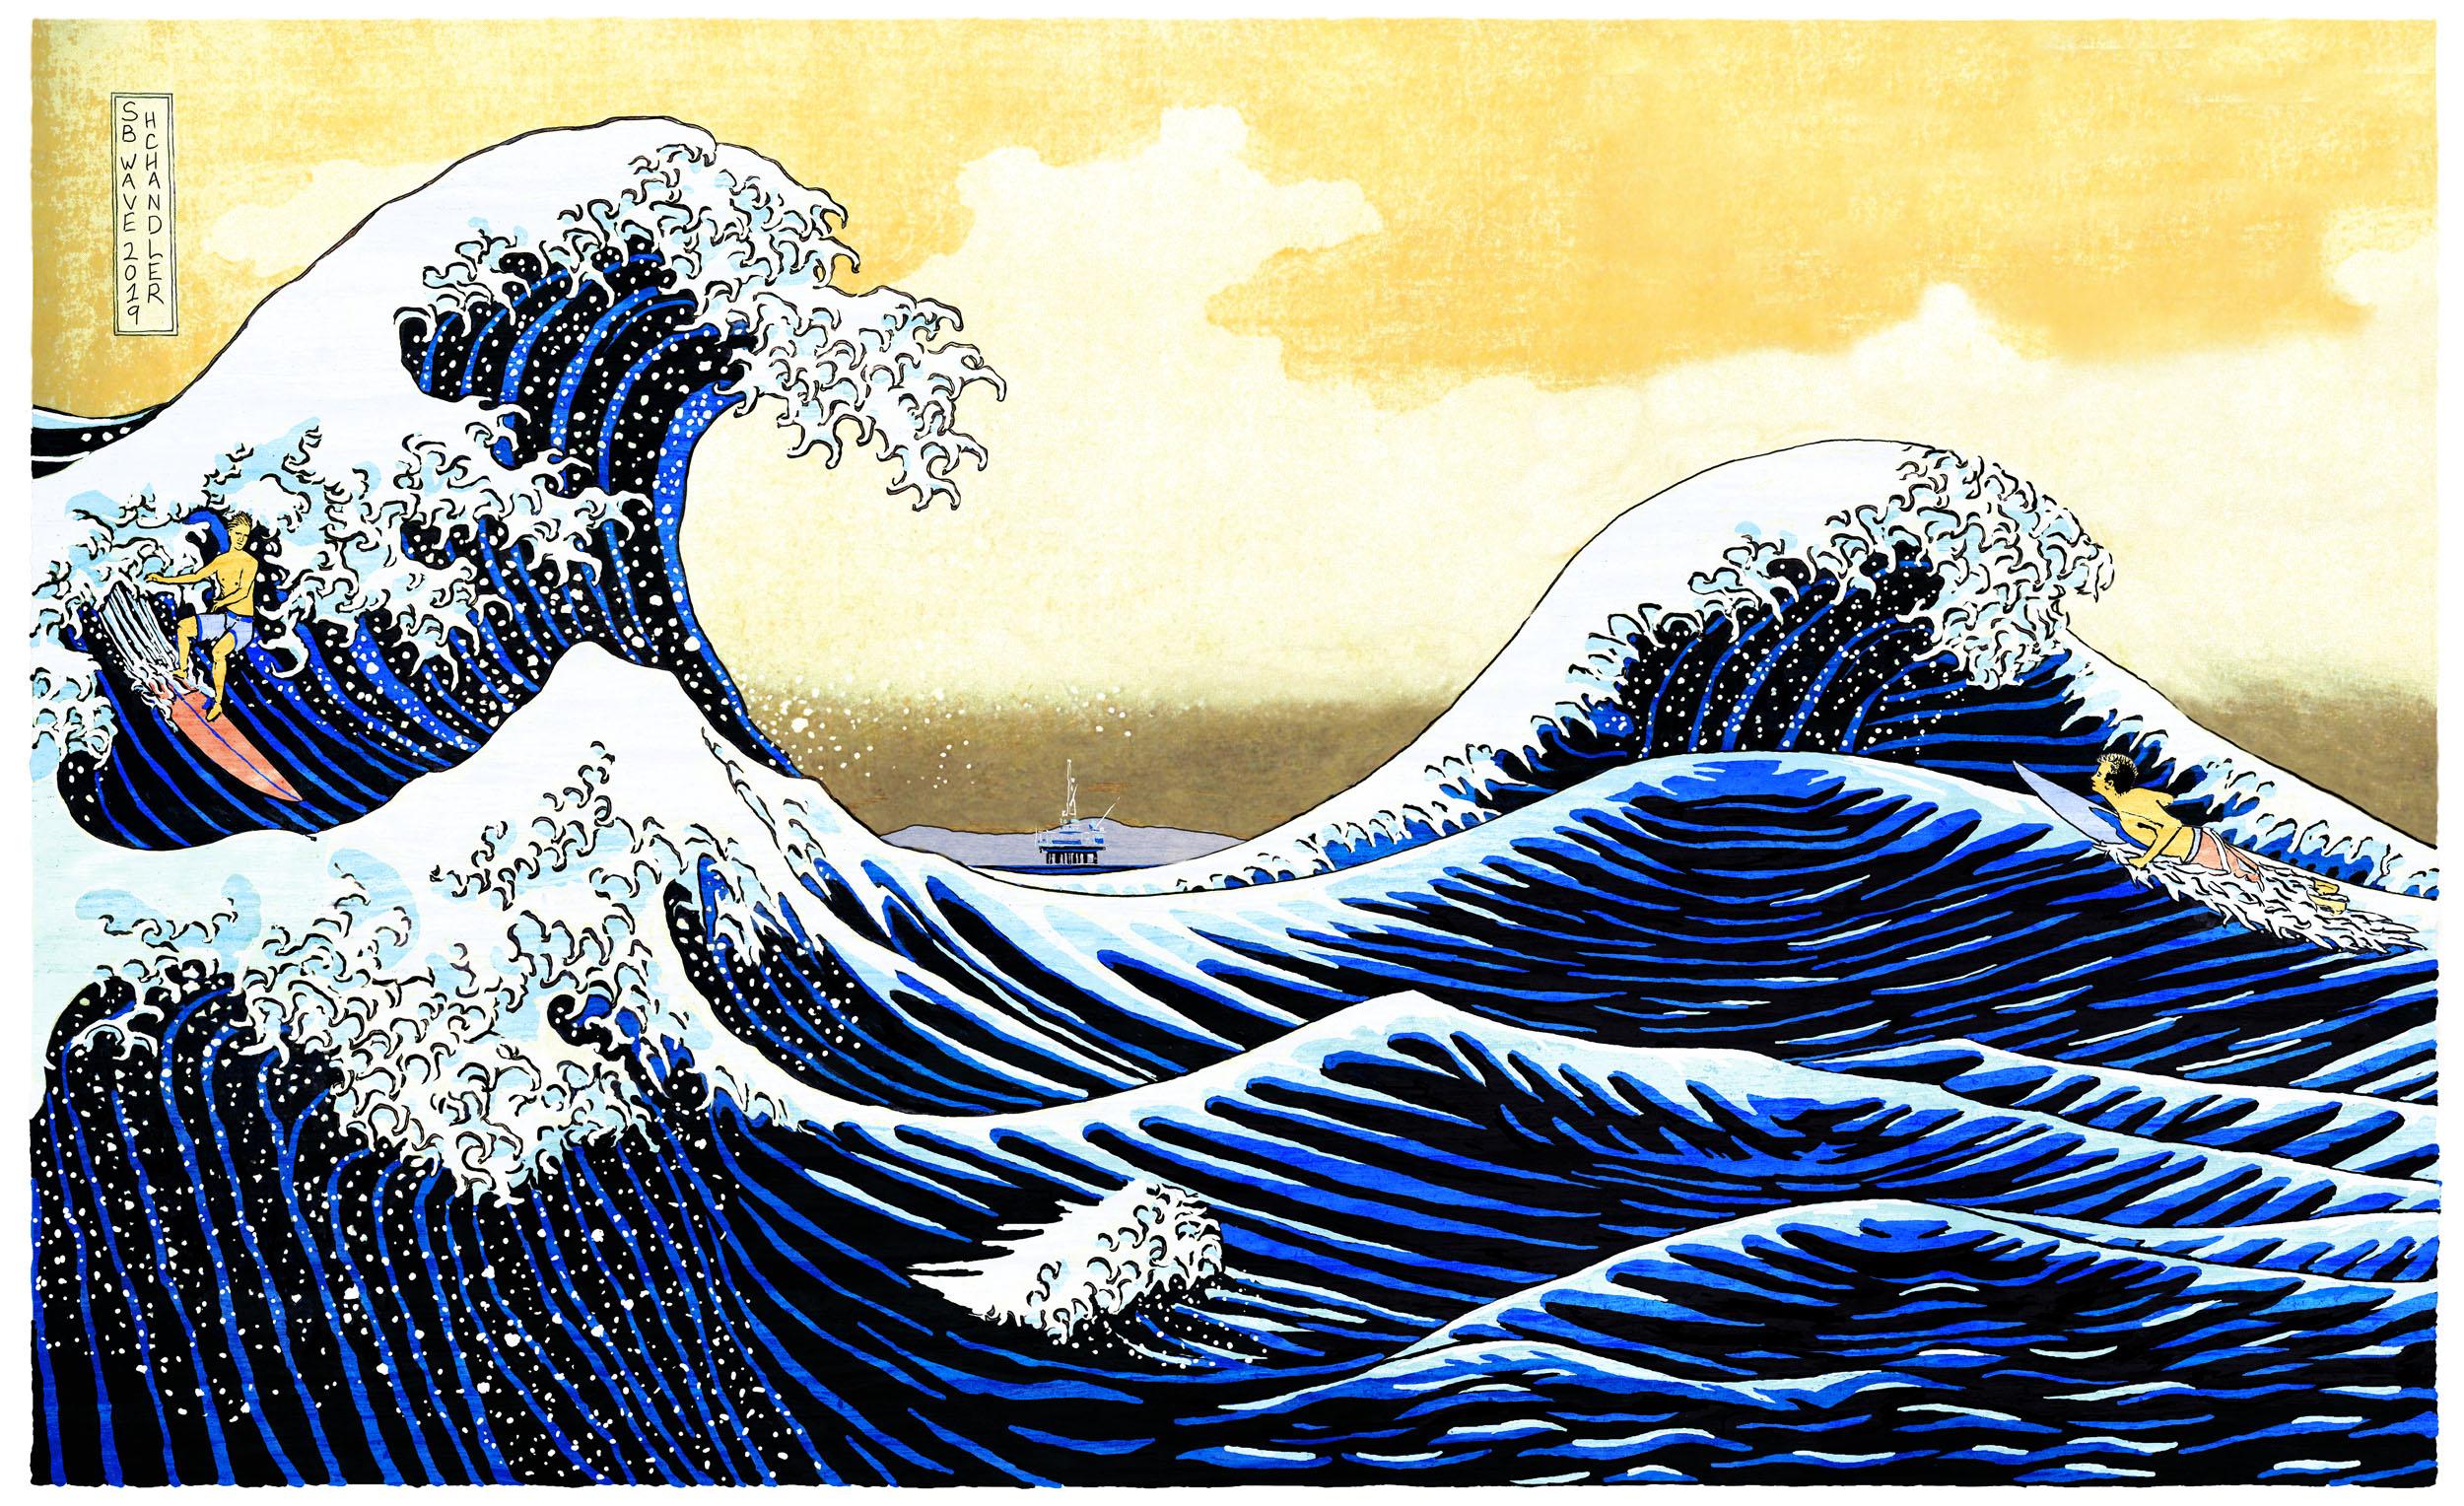 Santa Barbara Wave artwork by Harry Chandler - art listed for sale on Artplode